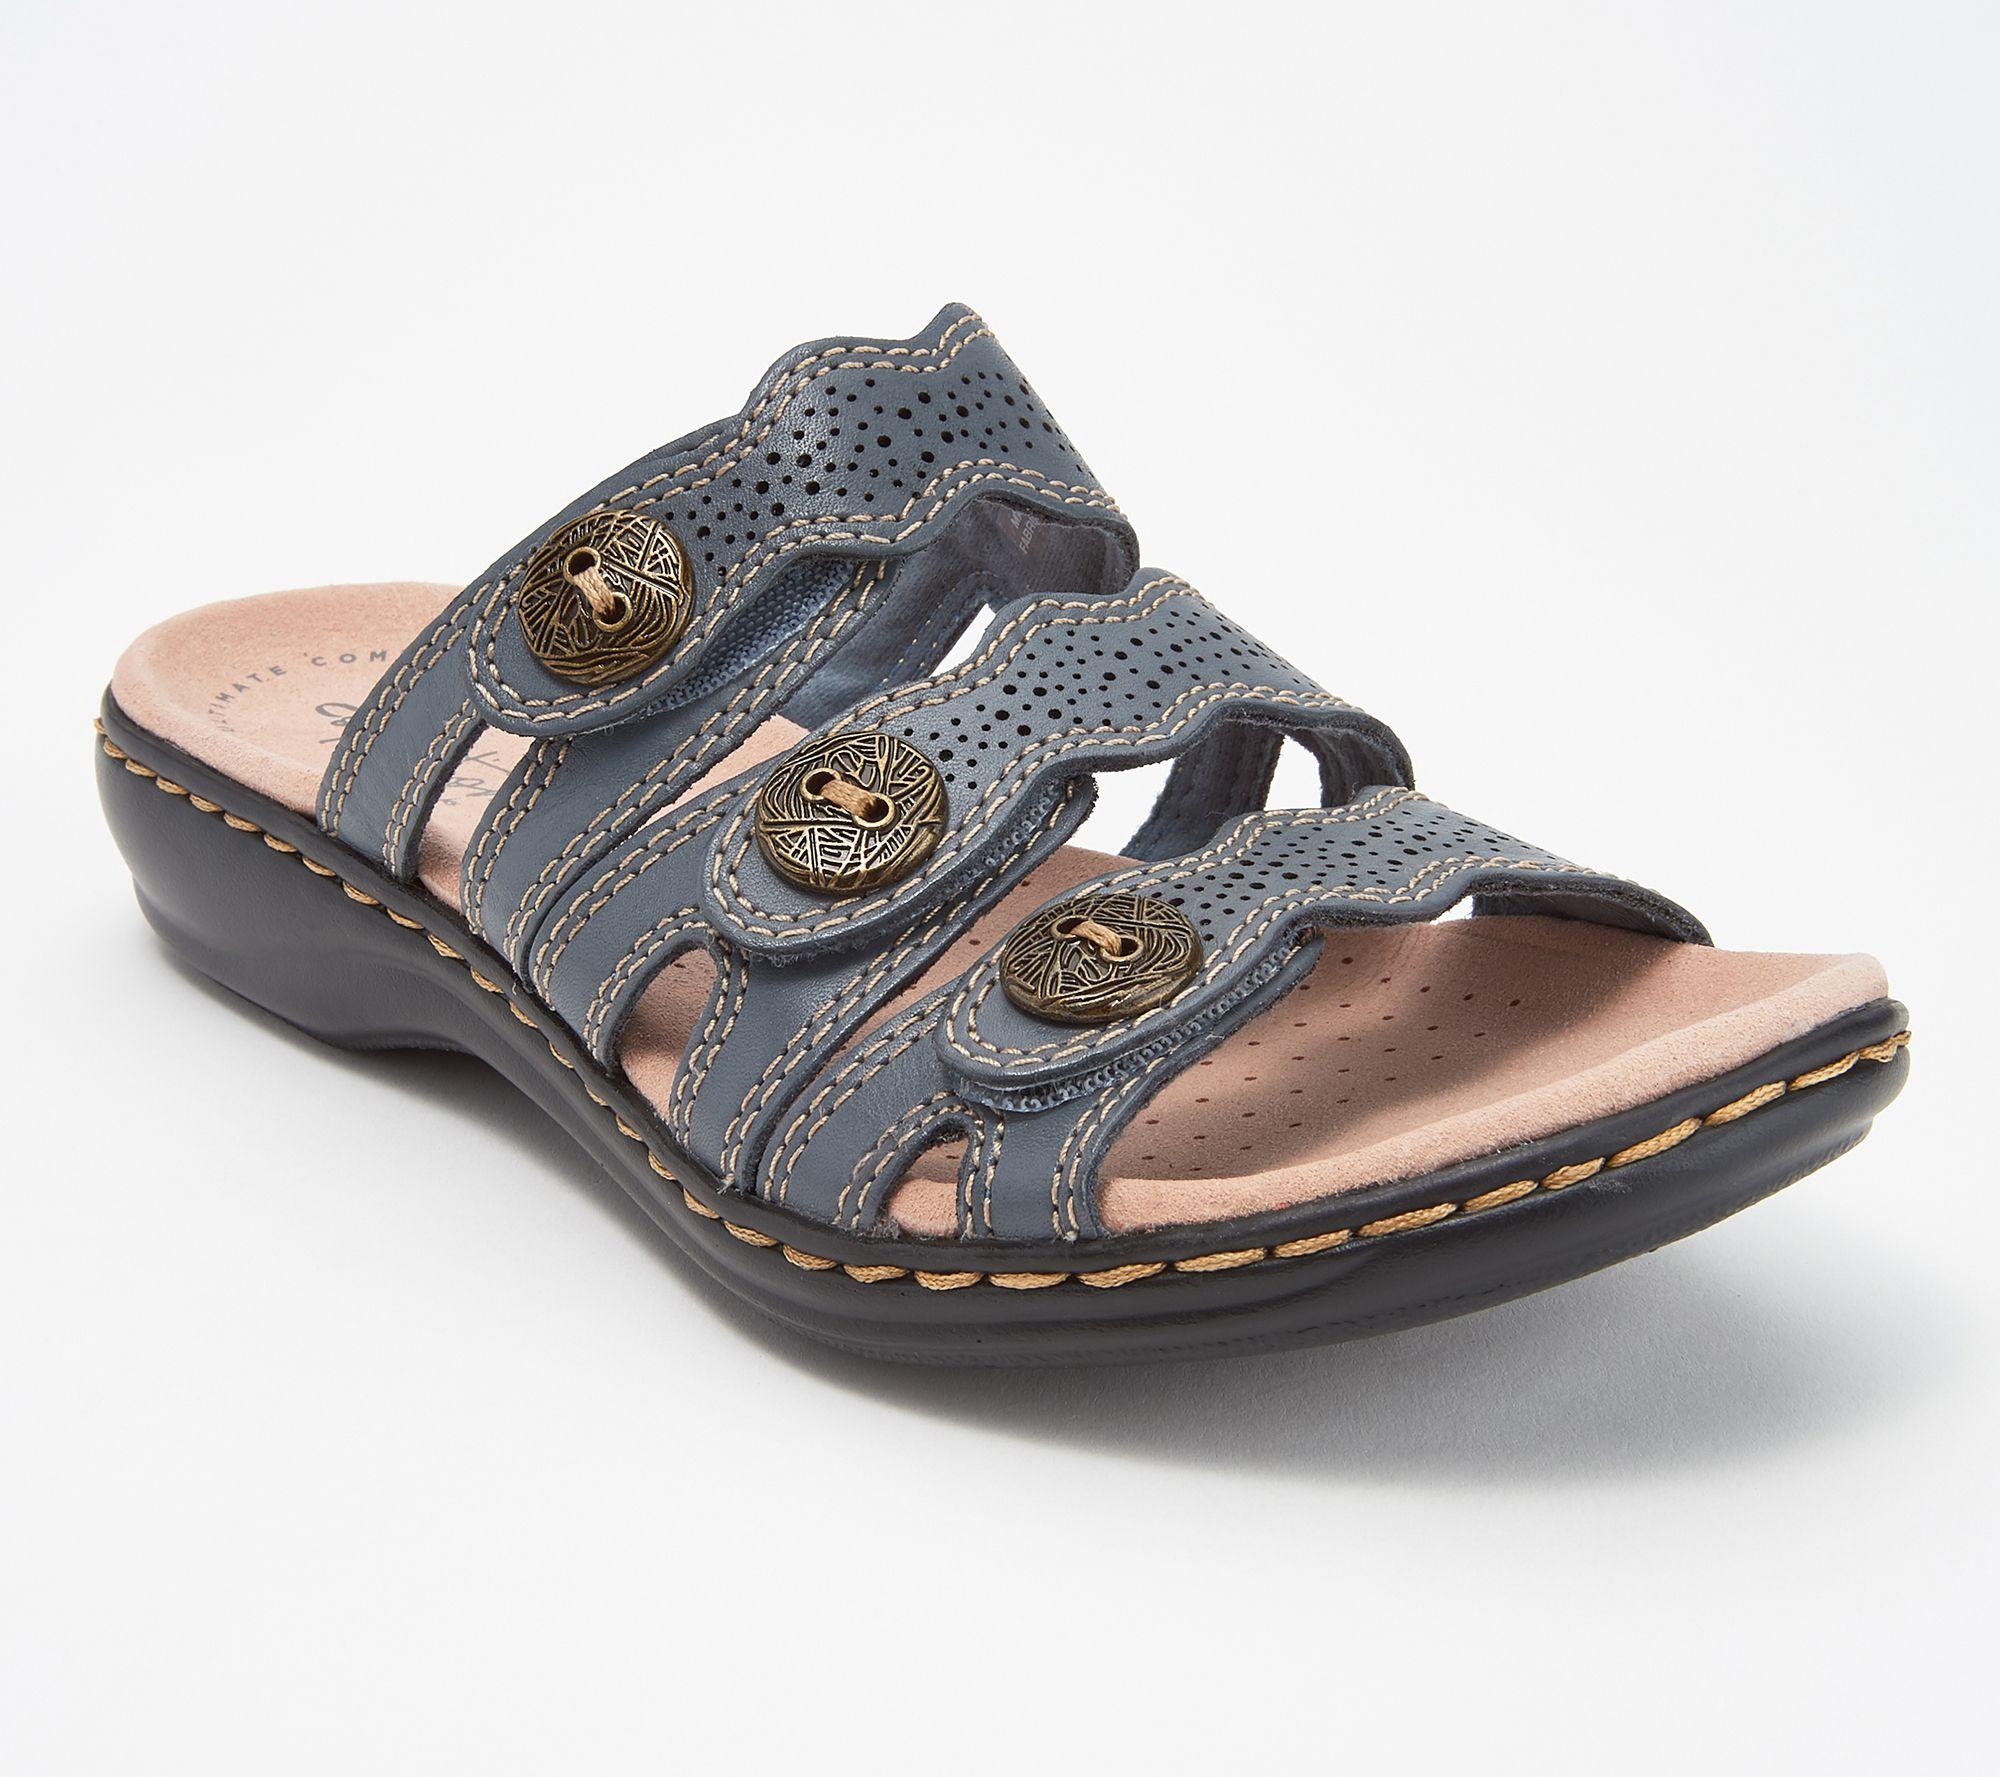 clearance classic big discount for sale Clarks Leather Lightweight Triple Adjust Sandals - Leisa Grace 6CXZf